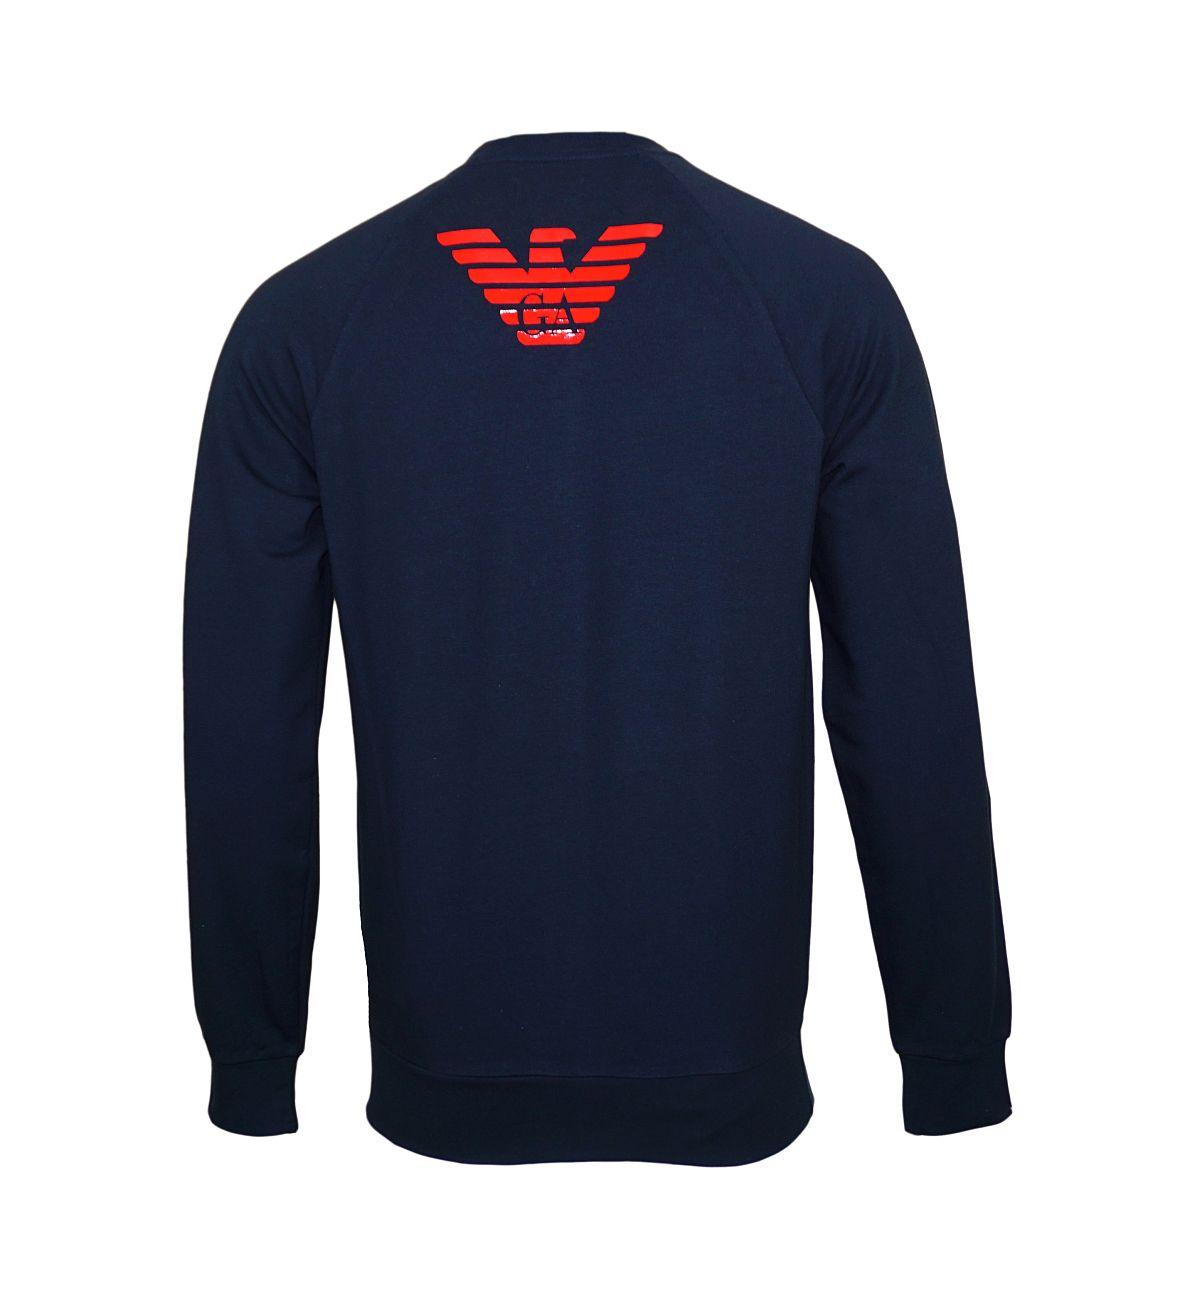 Emporio Armani Sweater Rundhals Pullover 111062 8P575 00135 F18-EAS1